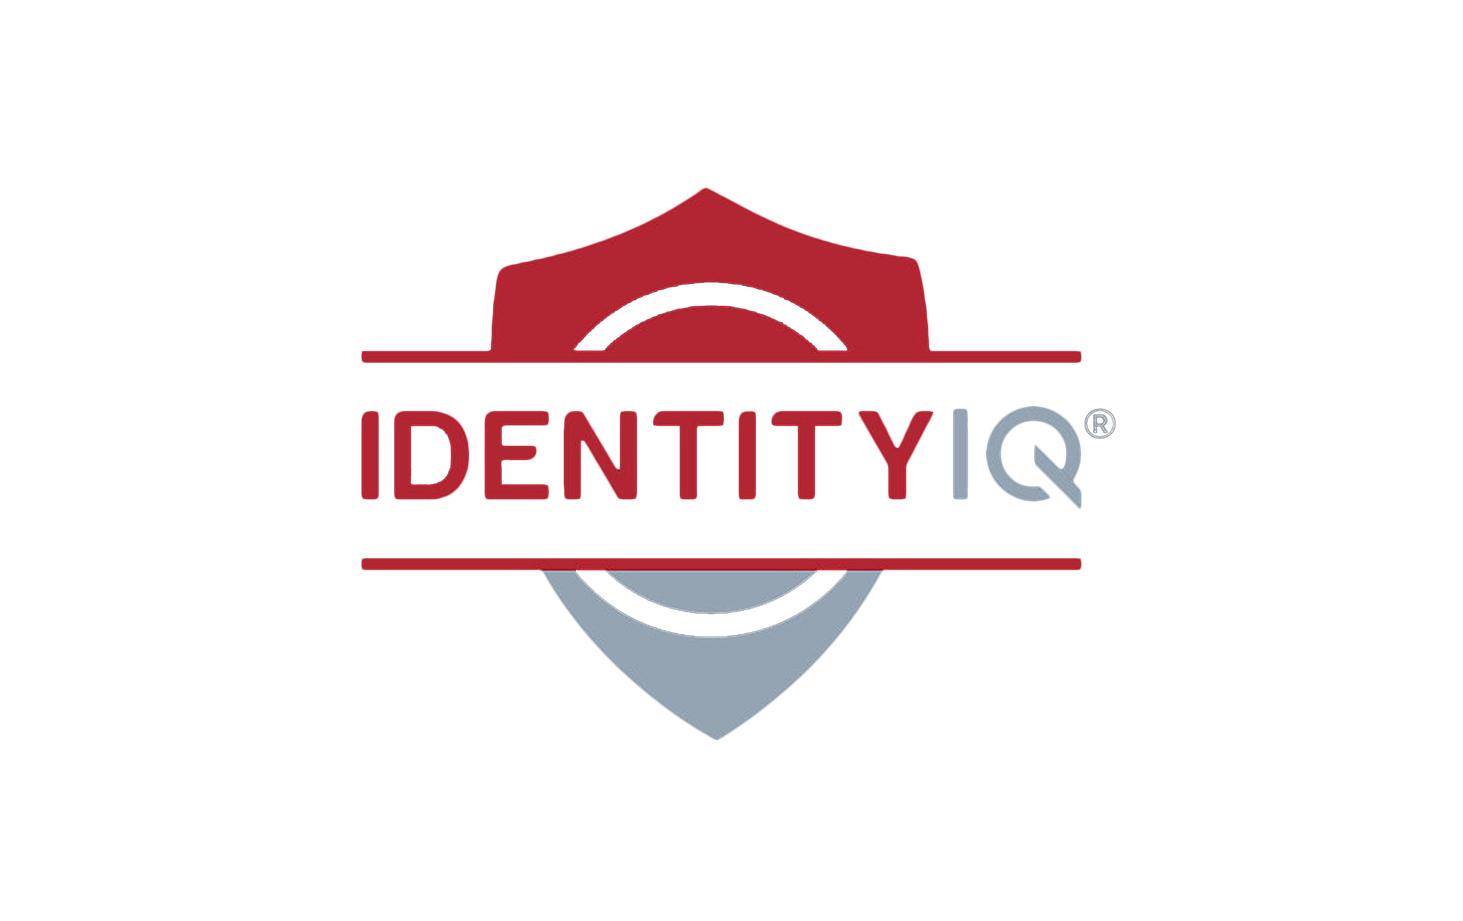 identityIQ_partner_logo